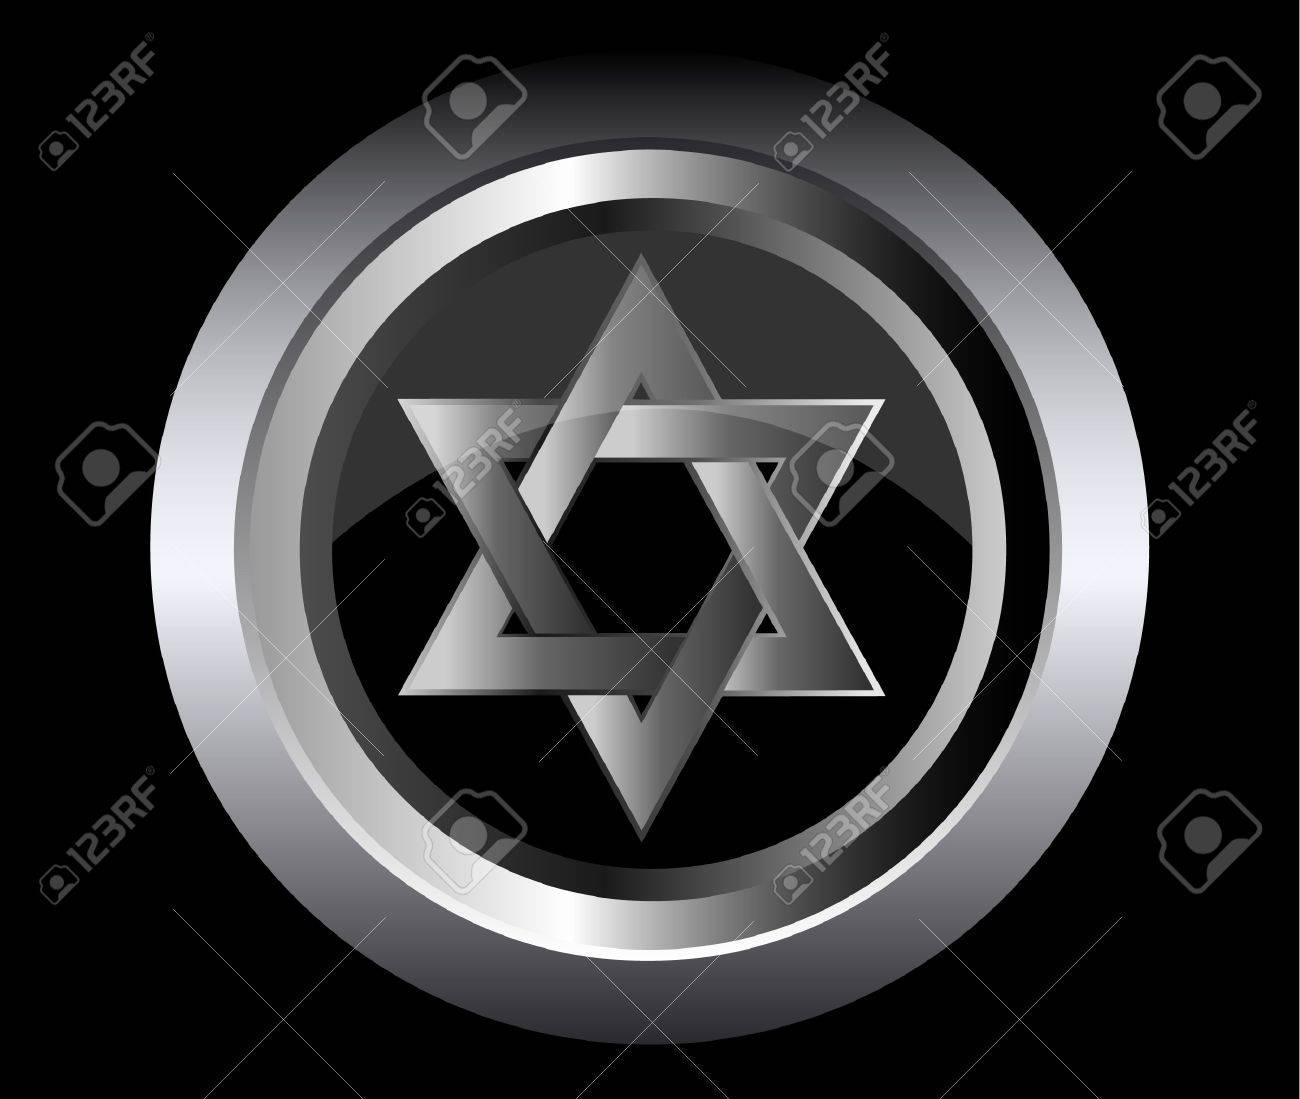 hebrew Jewish Star of magen david in black metal button Stock Vector - 15138835